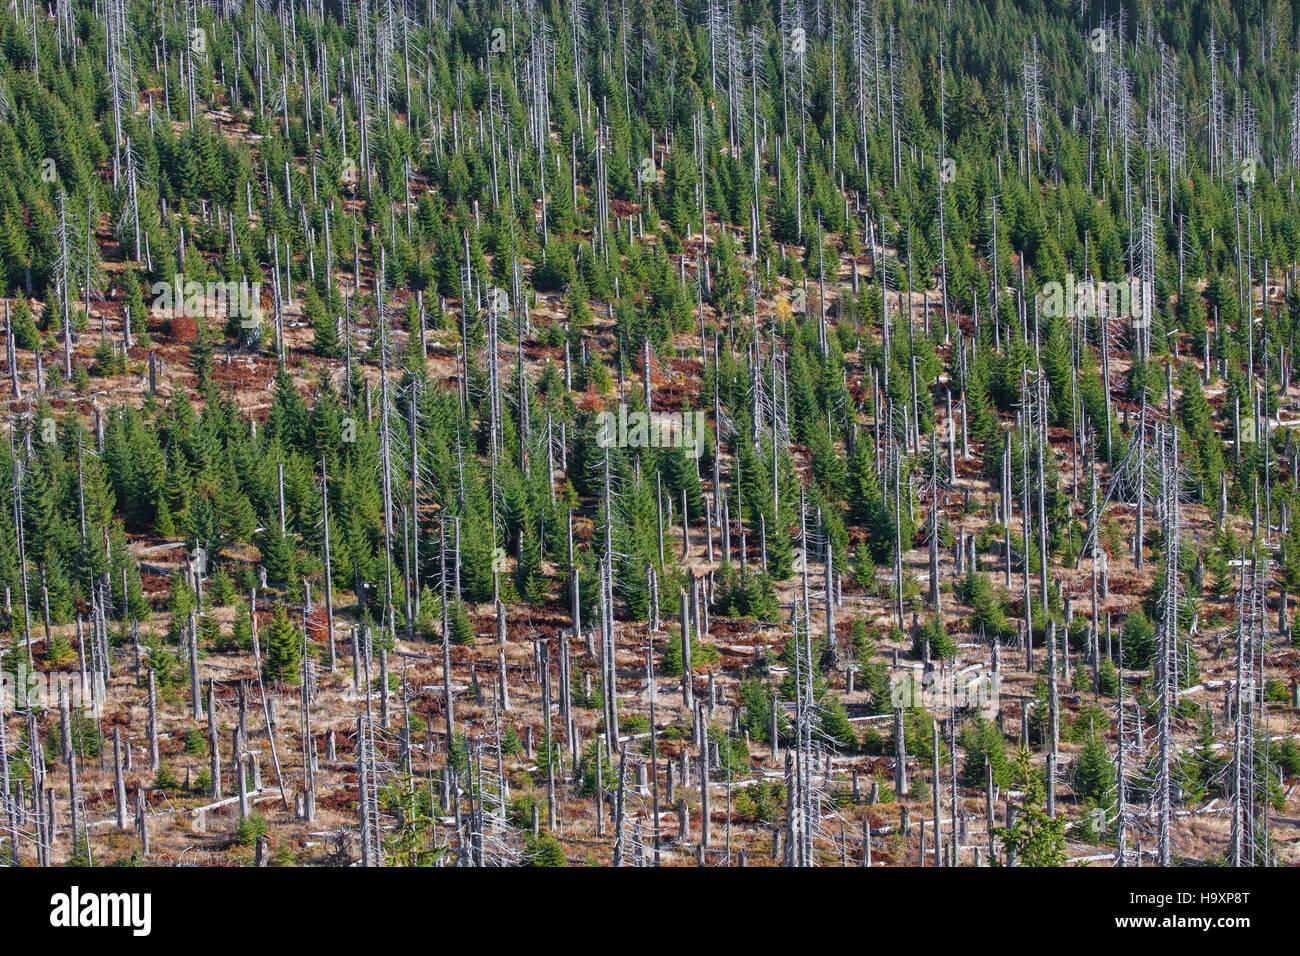 Broken dead spruce trees afflicted by European spruce bark beetle (Ips typographus L.) infestation at Lusen, Bavarian - Stock Image